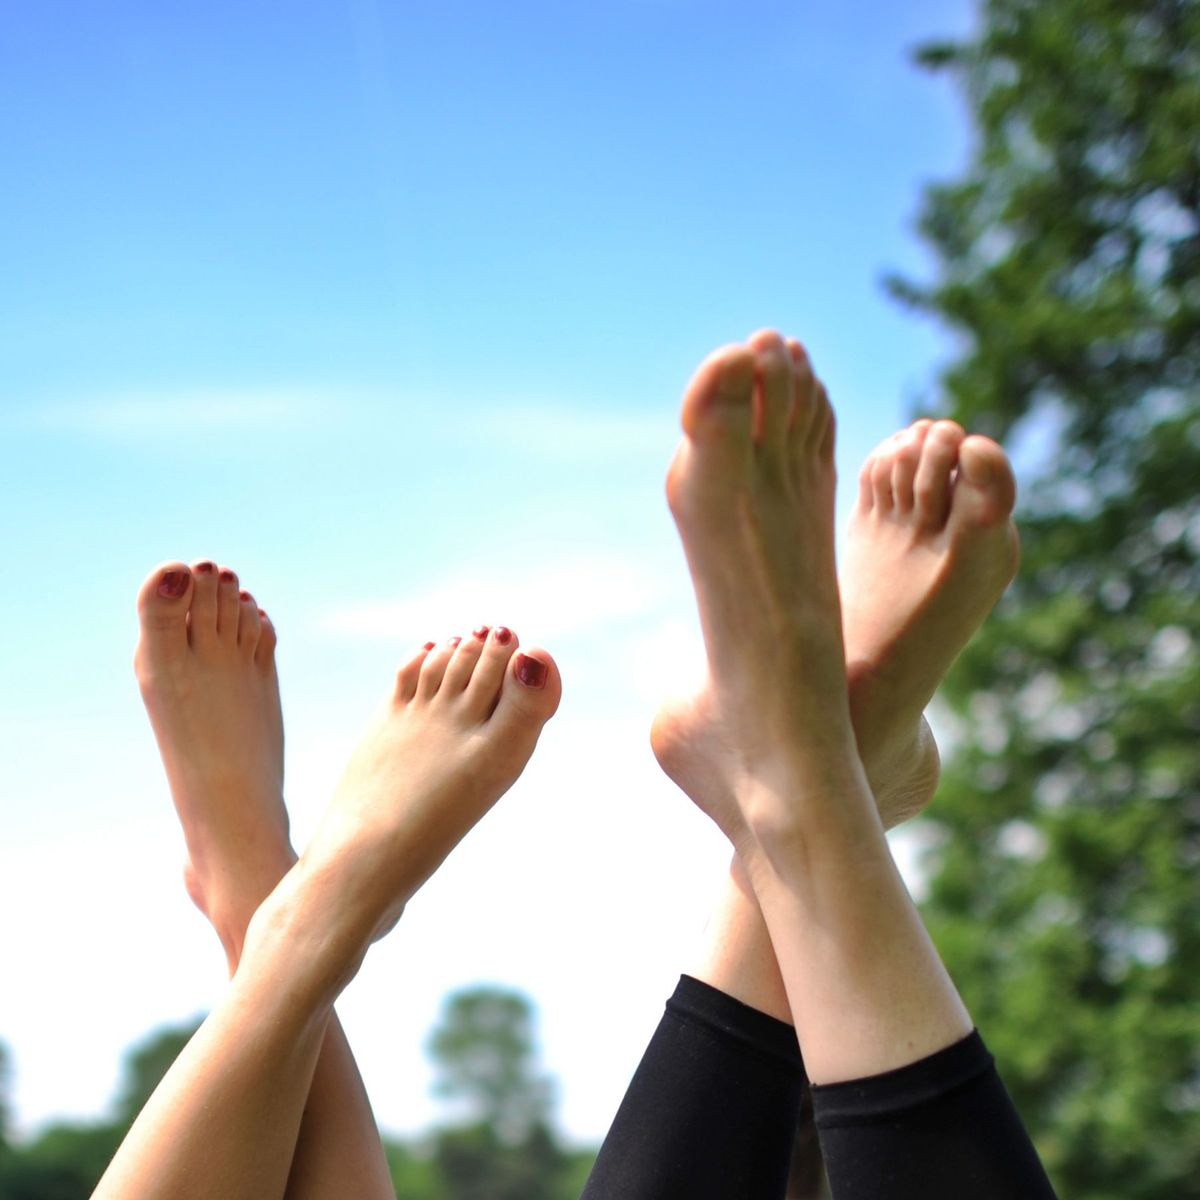 Zehennagel ziehen lassen eingewachsener Nagel ziehen